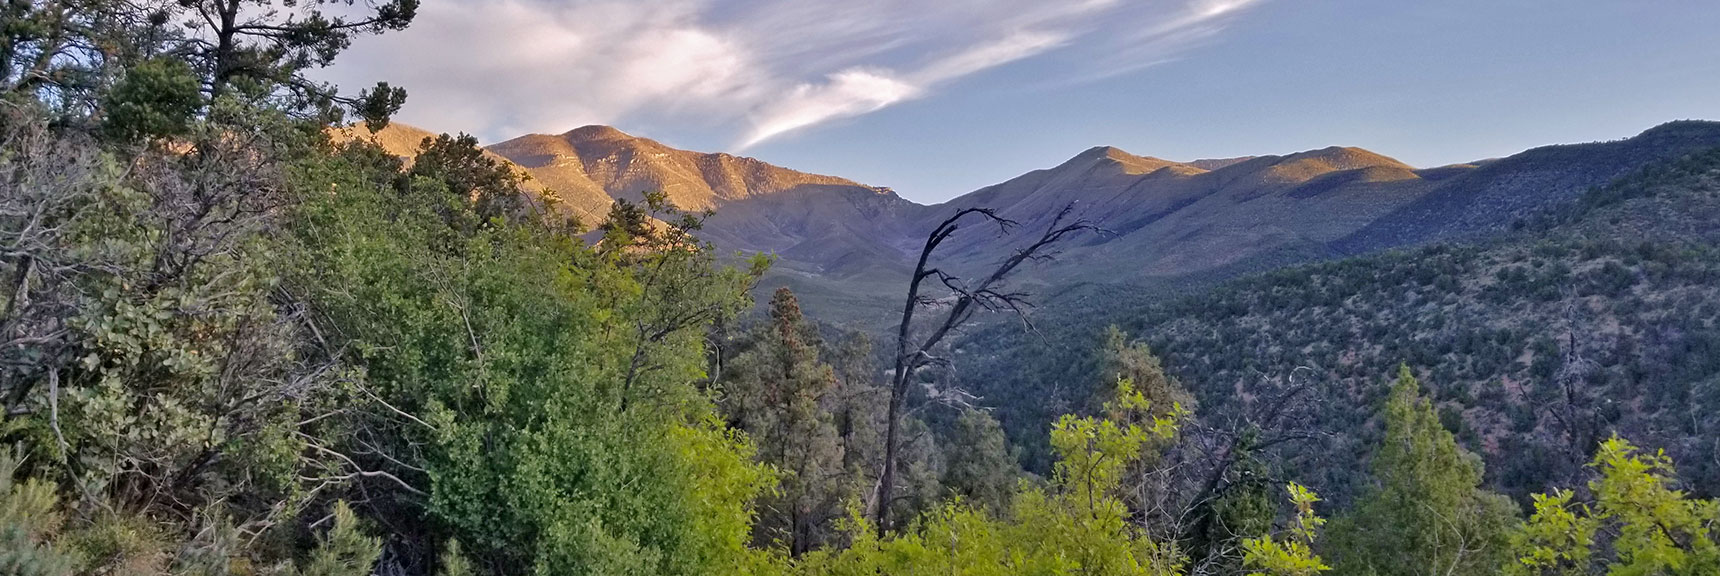 Griffith Peak, Harris Mountain and Saddle View Up Lovell Canyon   Griffith Peak from Lovell Canyon Trailhead, Nevada, 004